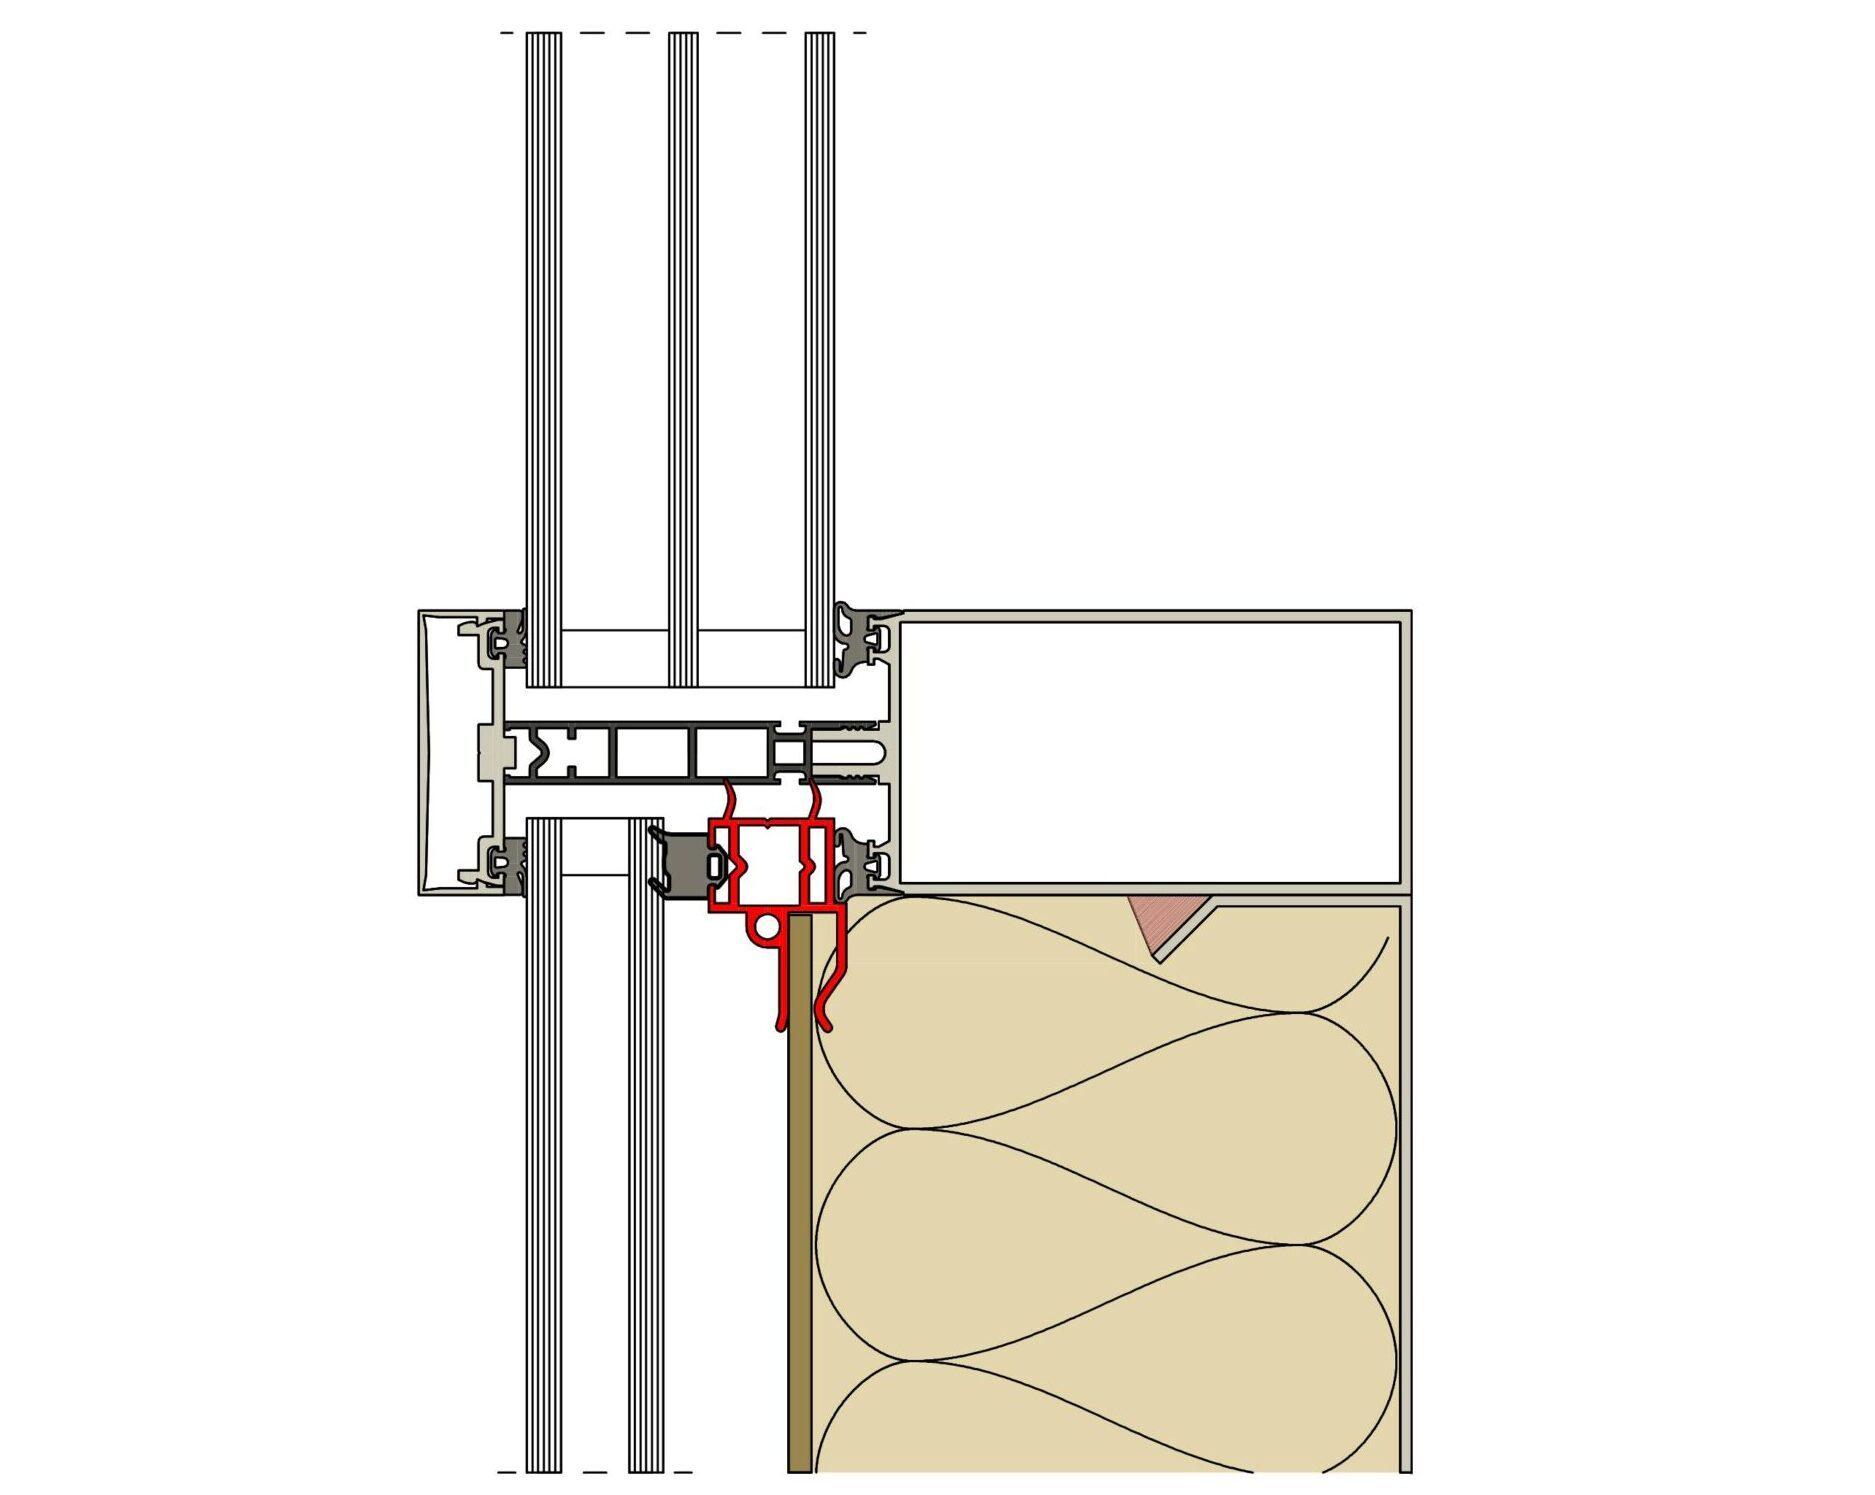 Parapet frame profiles, parapet area, parapet, spandrel glazing, parapet infill